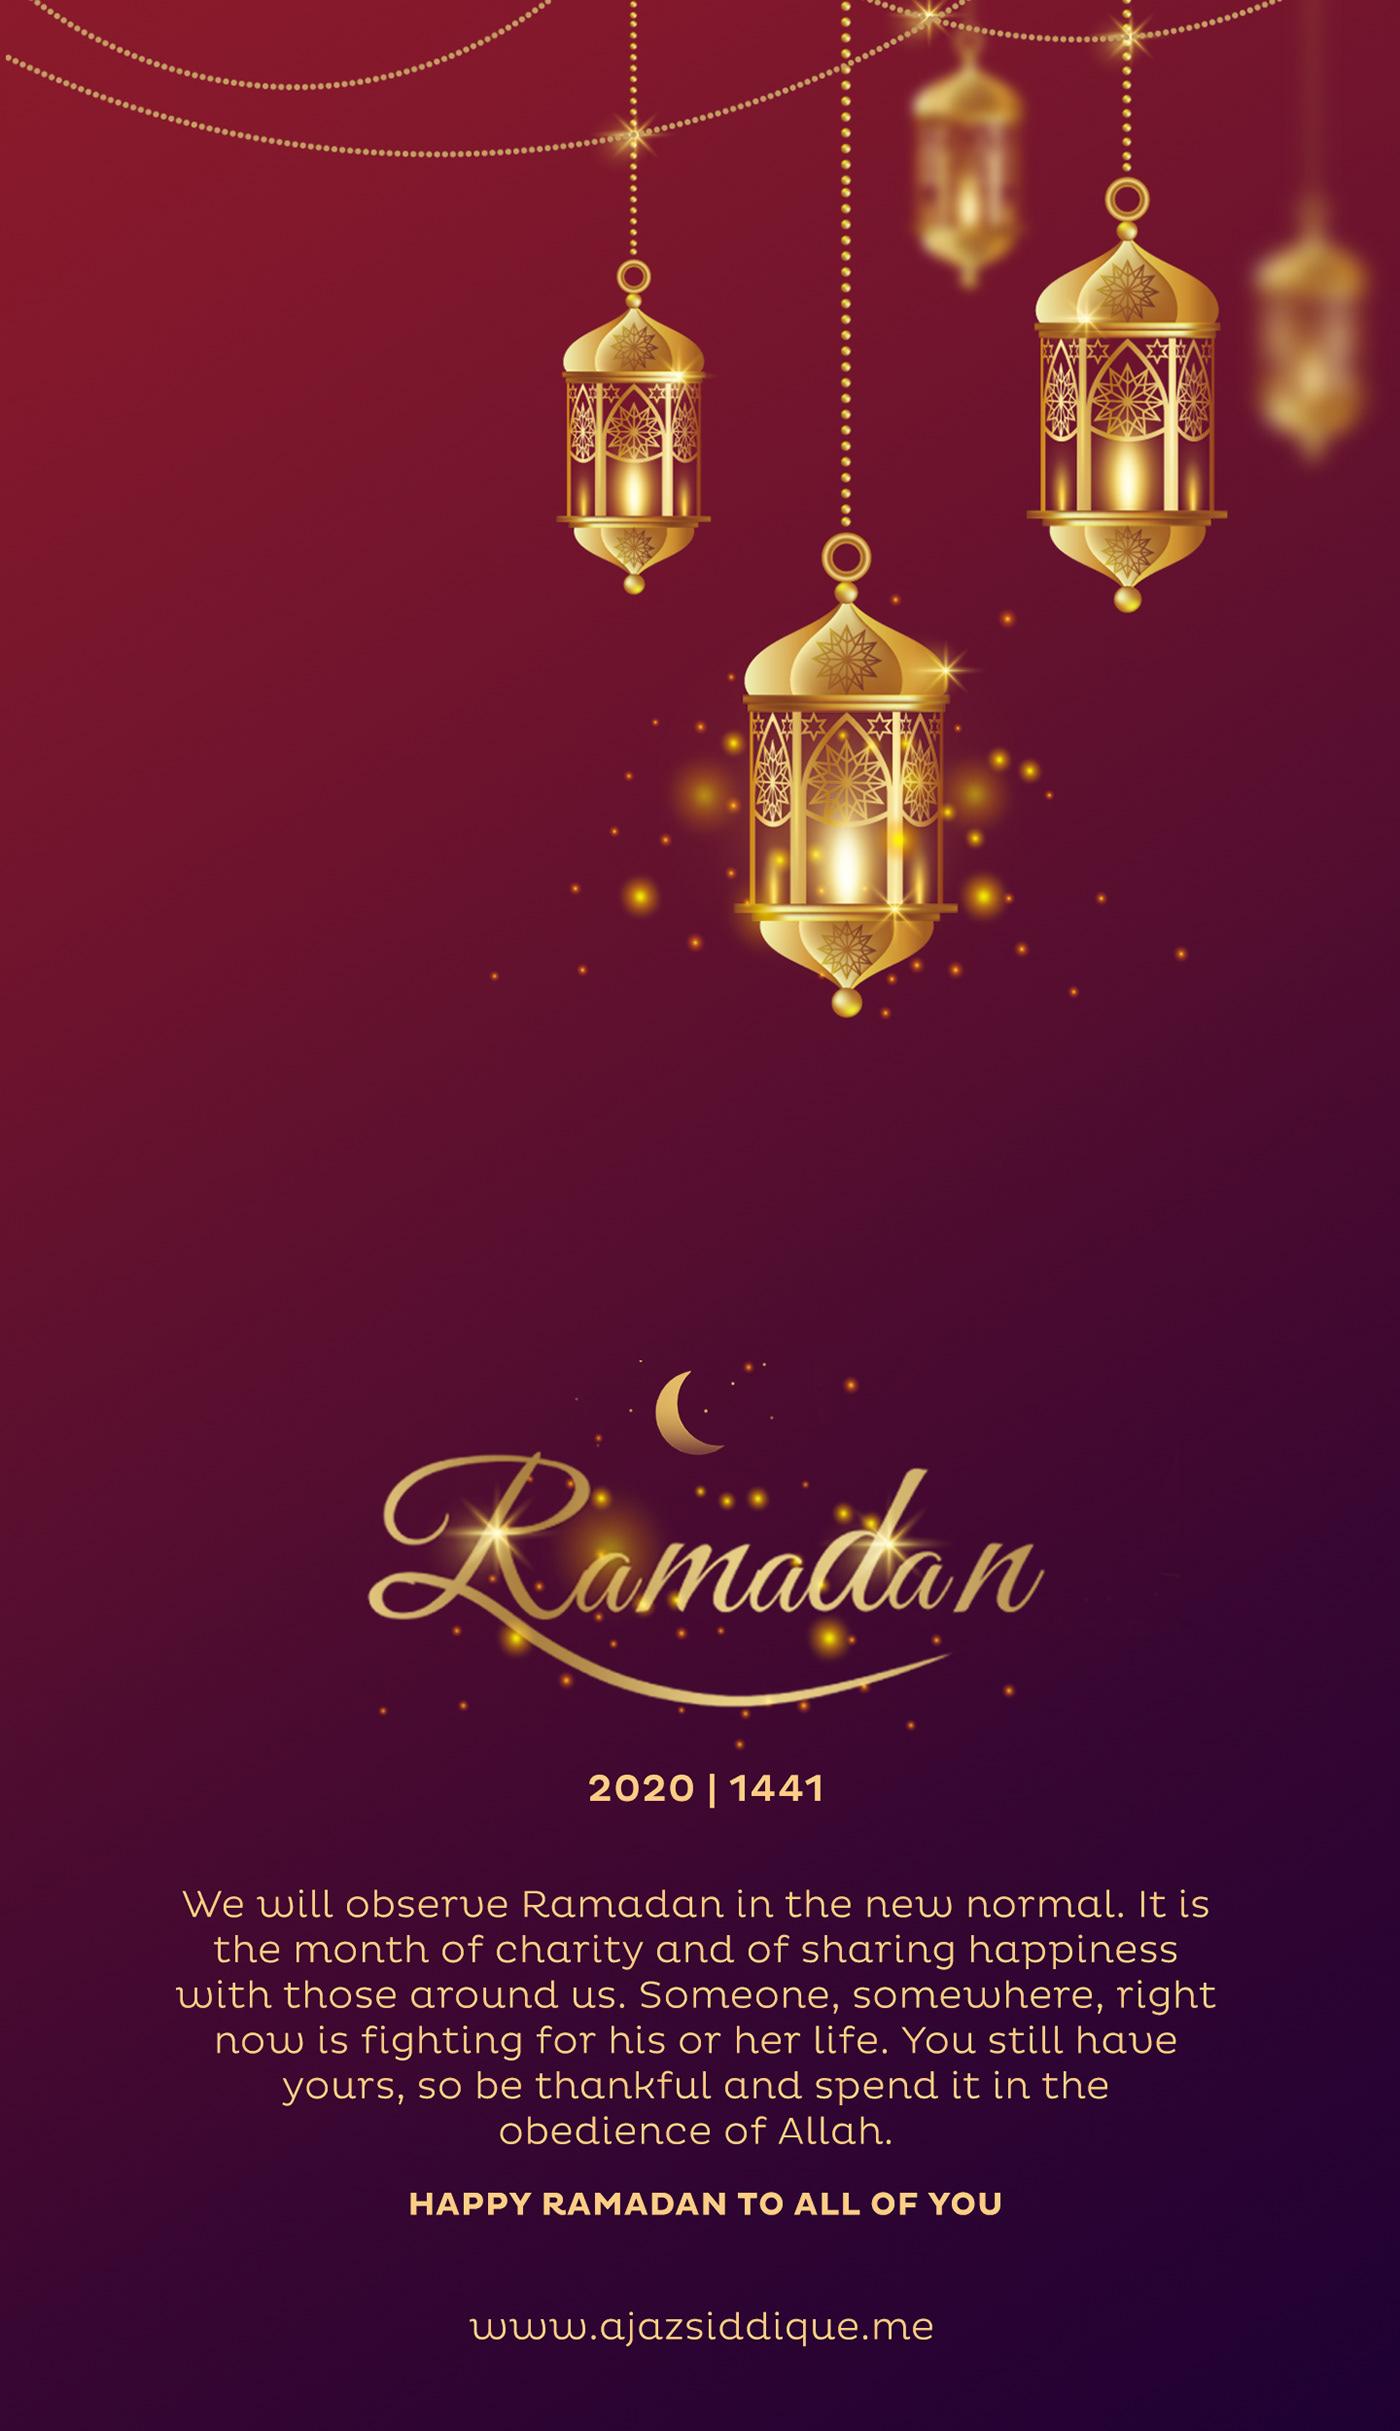 Ramadhan ramazan